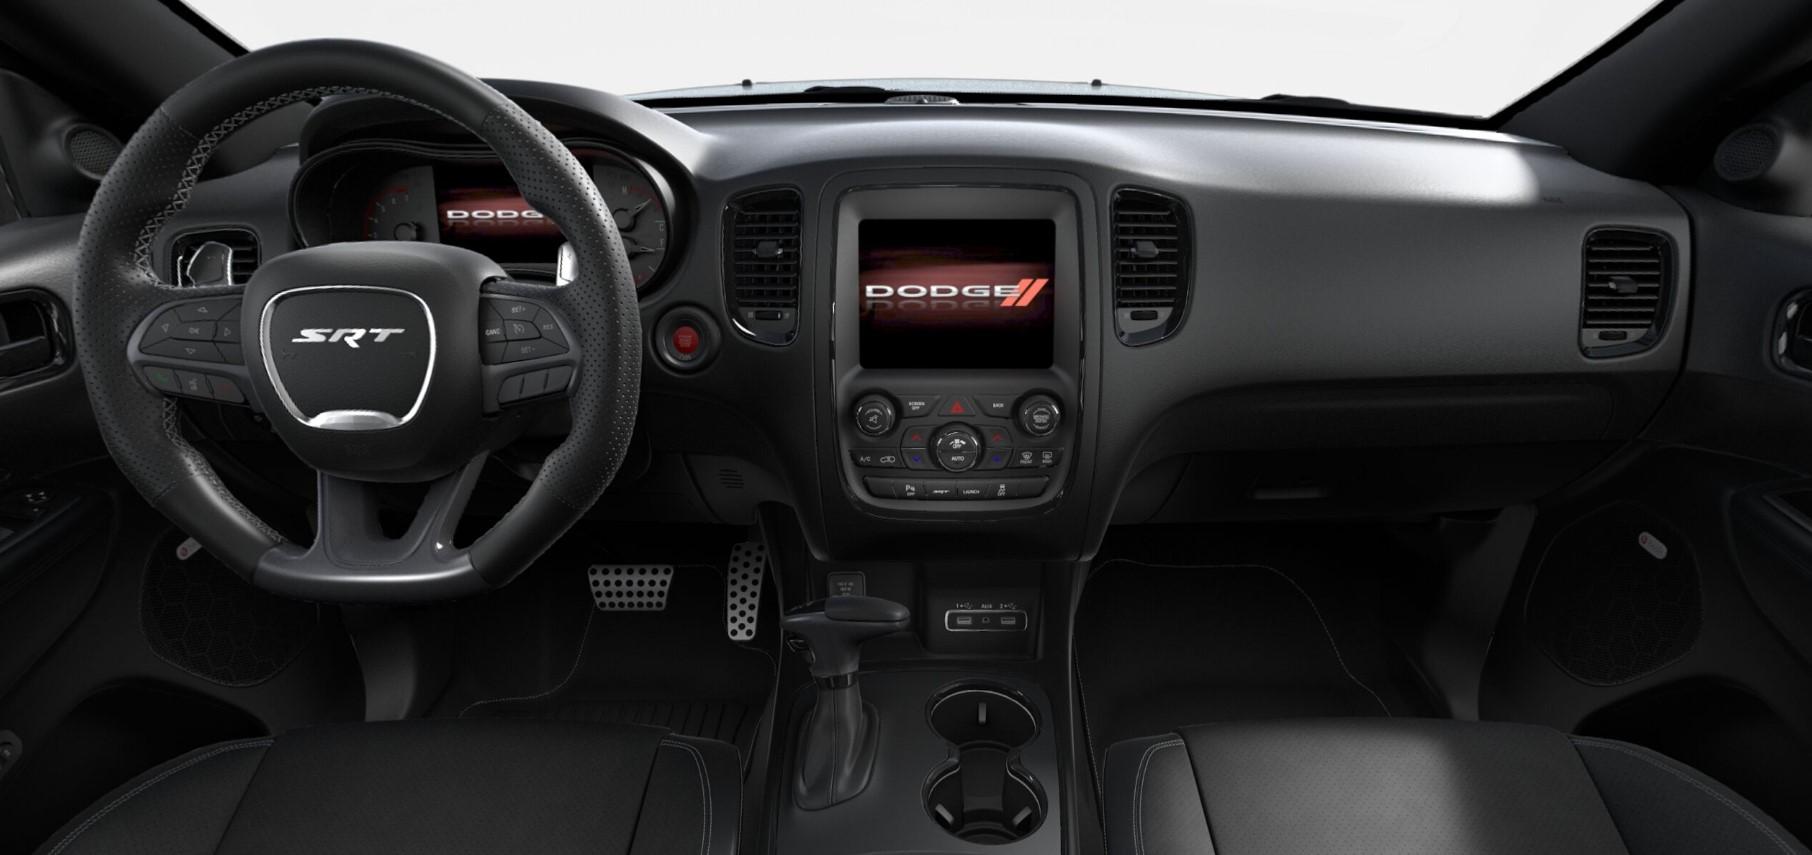 2018 Dodge Durango Srt Jeep Chrysler Dodge Ram Of Ontario